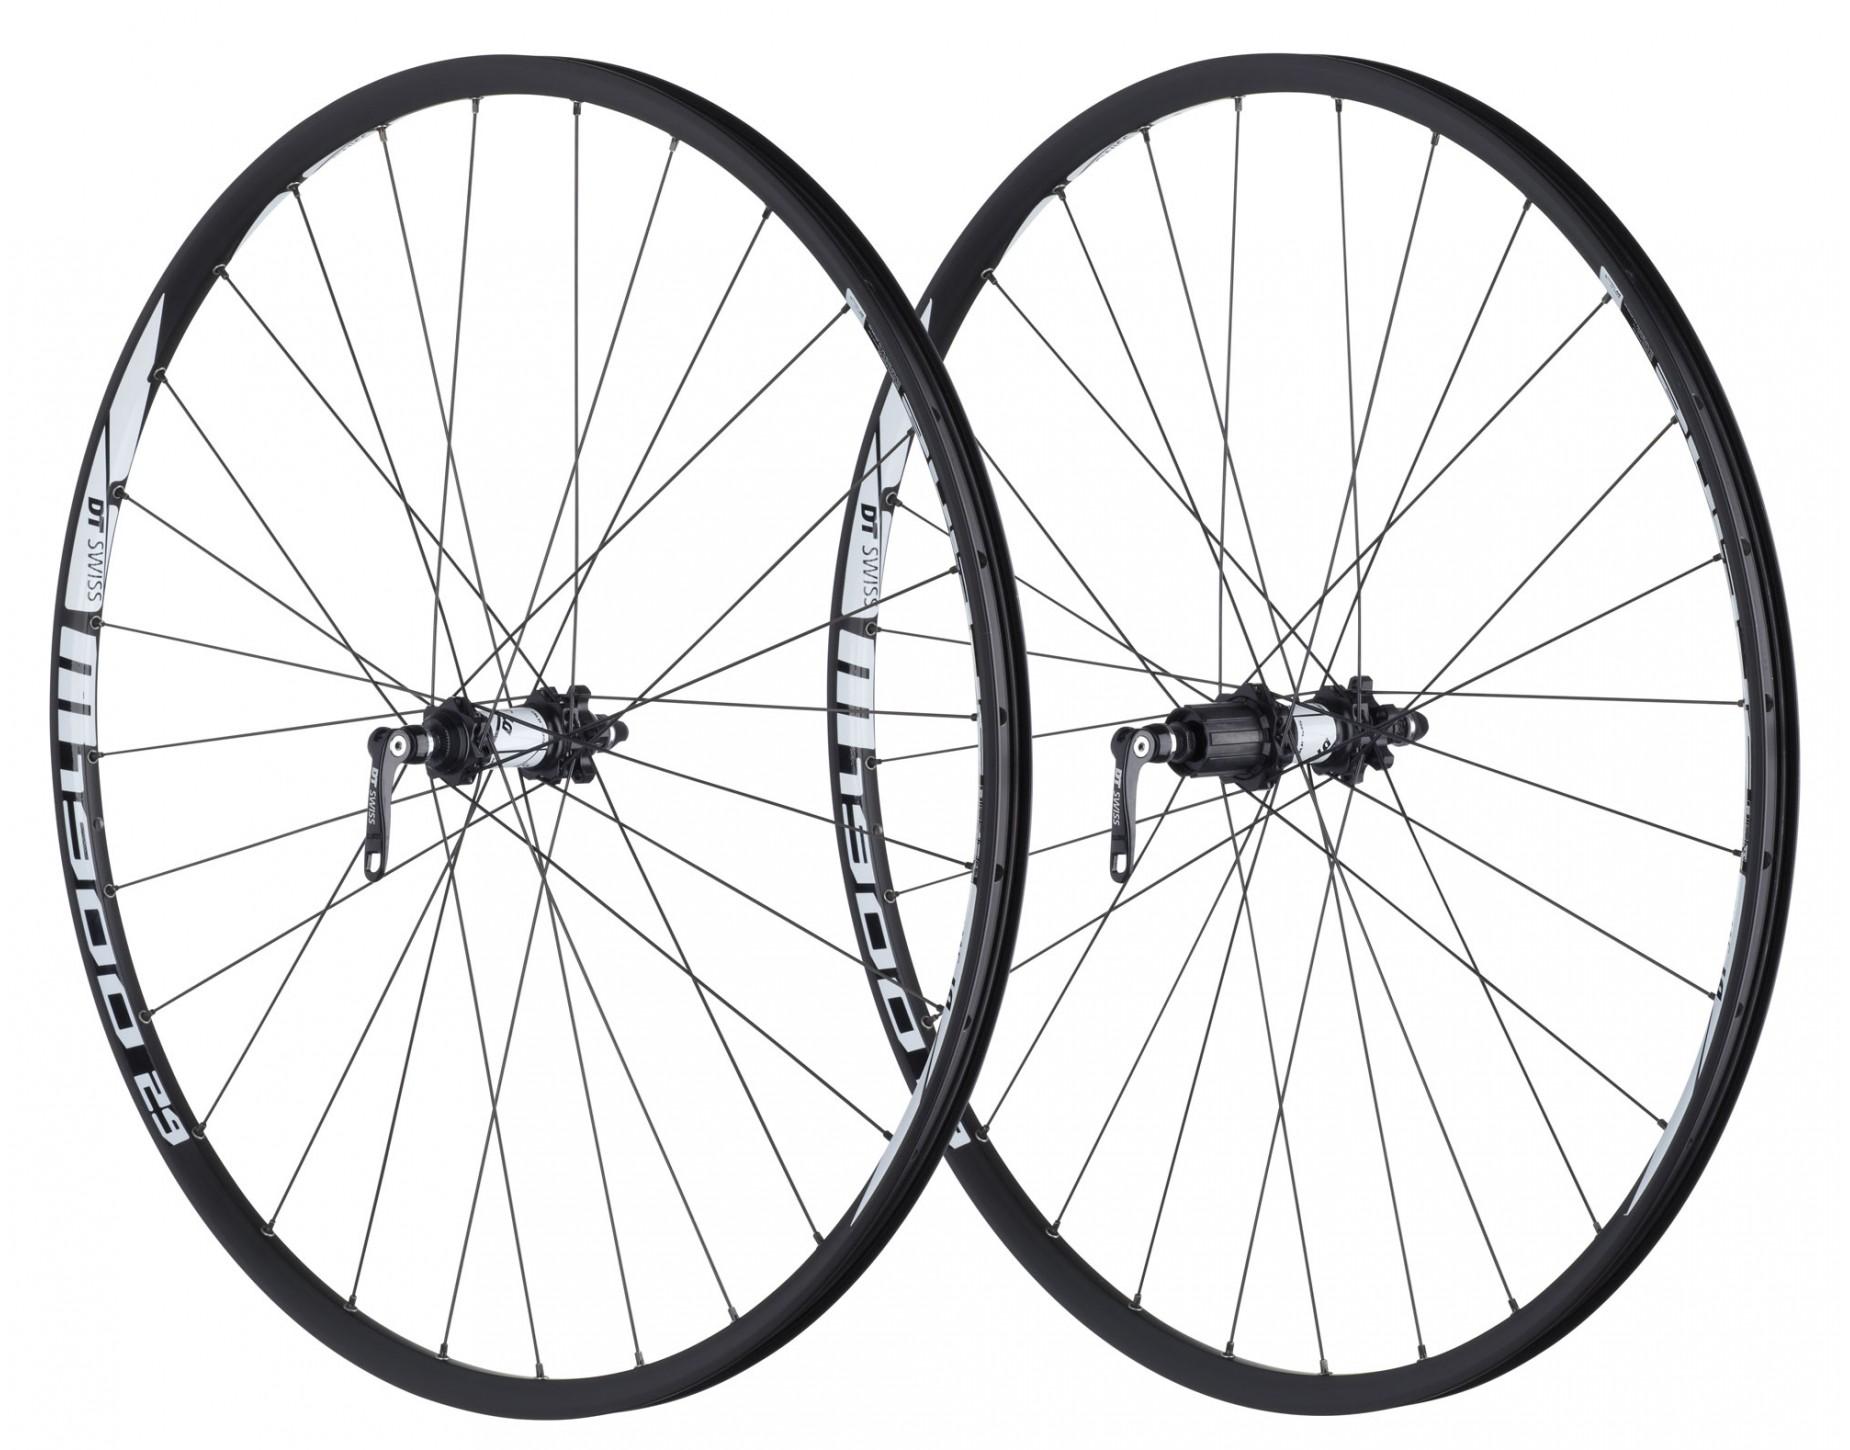 طوقه کامل دوچرخه دی تی سویس 29 DT SWISS M1900 SPLINE 29